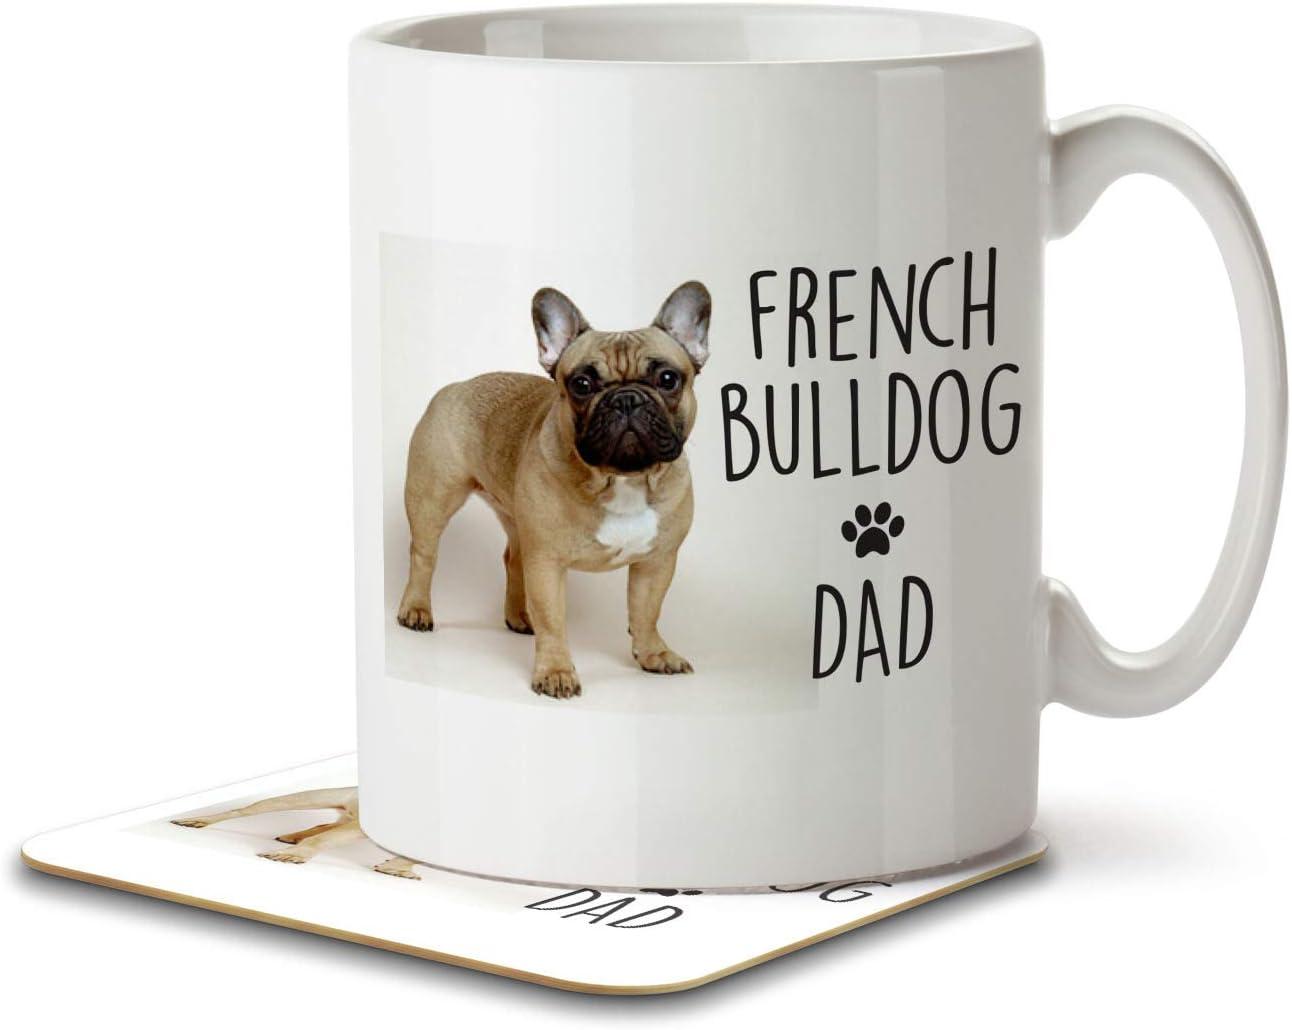 French Bulldog Dad Mug And Coaster By Inky Penguin Amazon Co Uk Kitchen Home